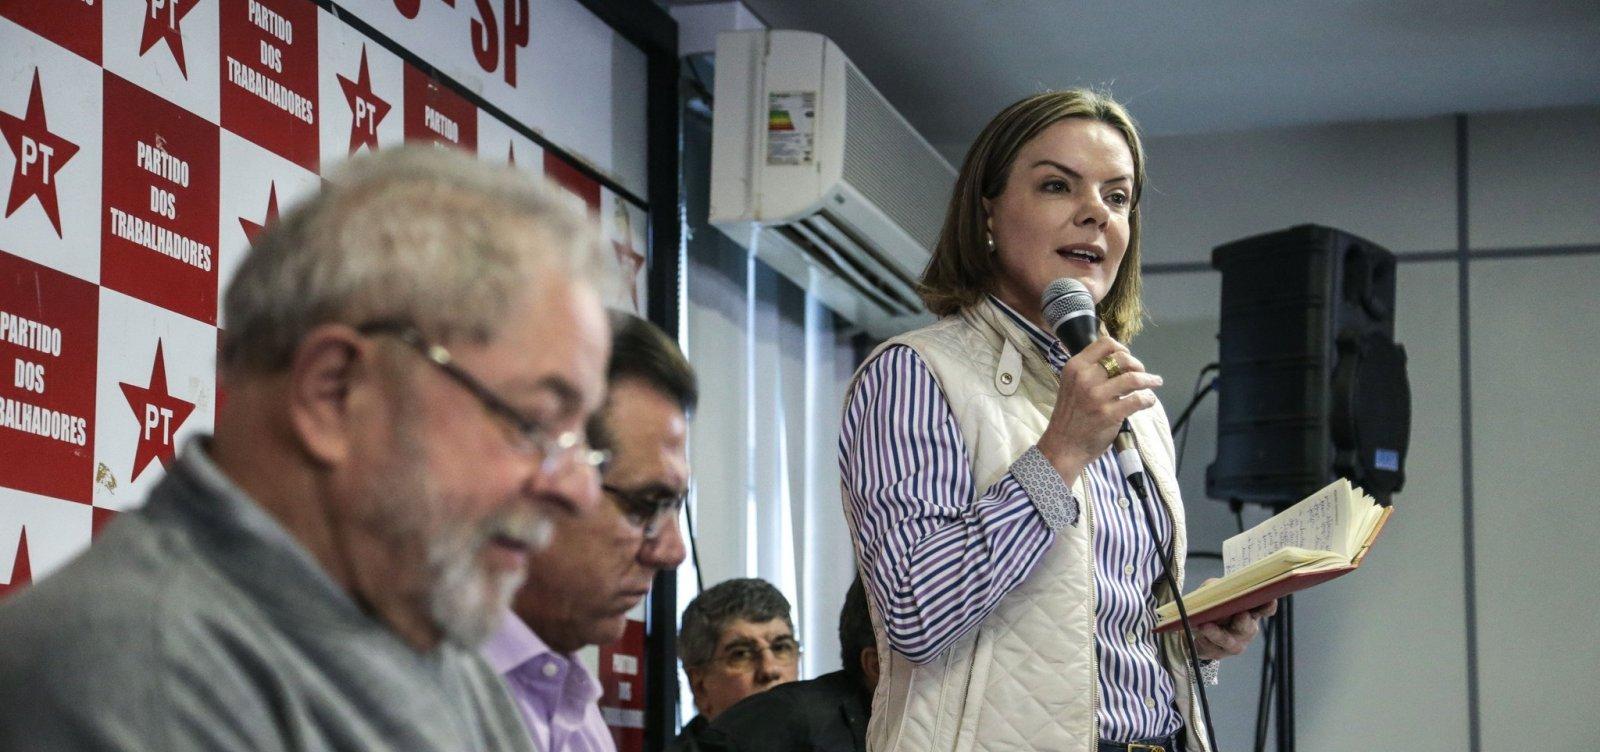 [PT ainda planeja indultar Lula caso vença eleições, diz colunista]